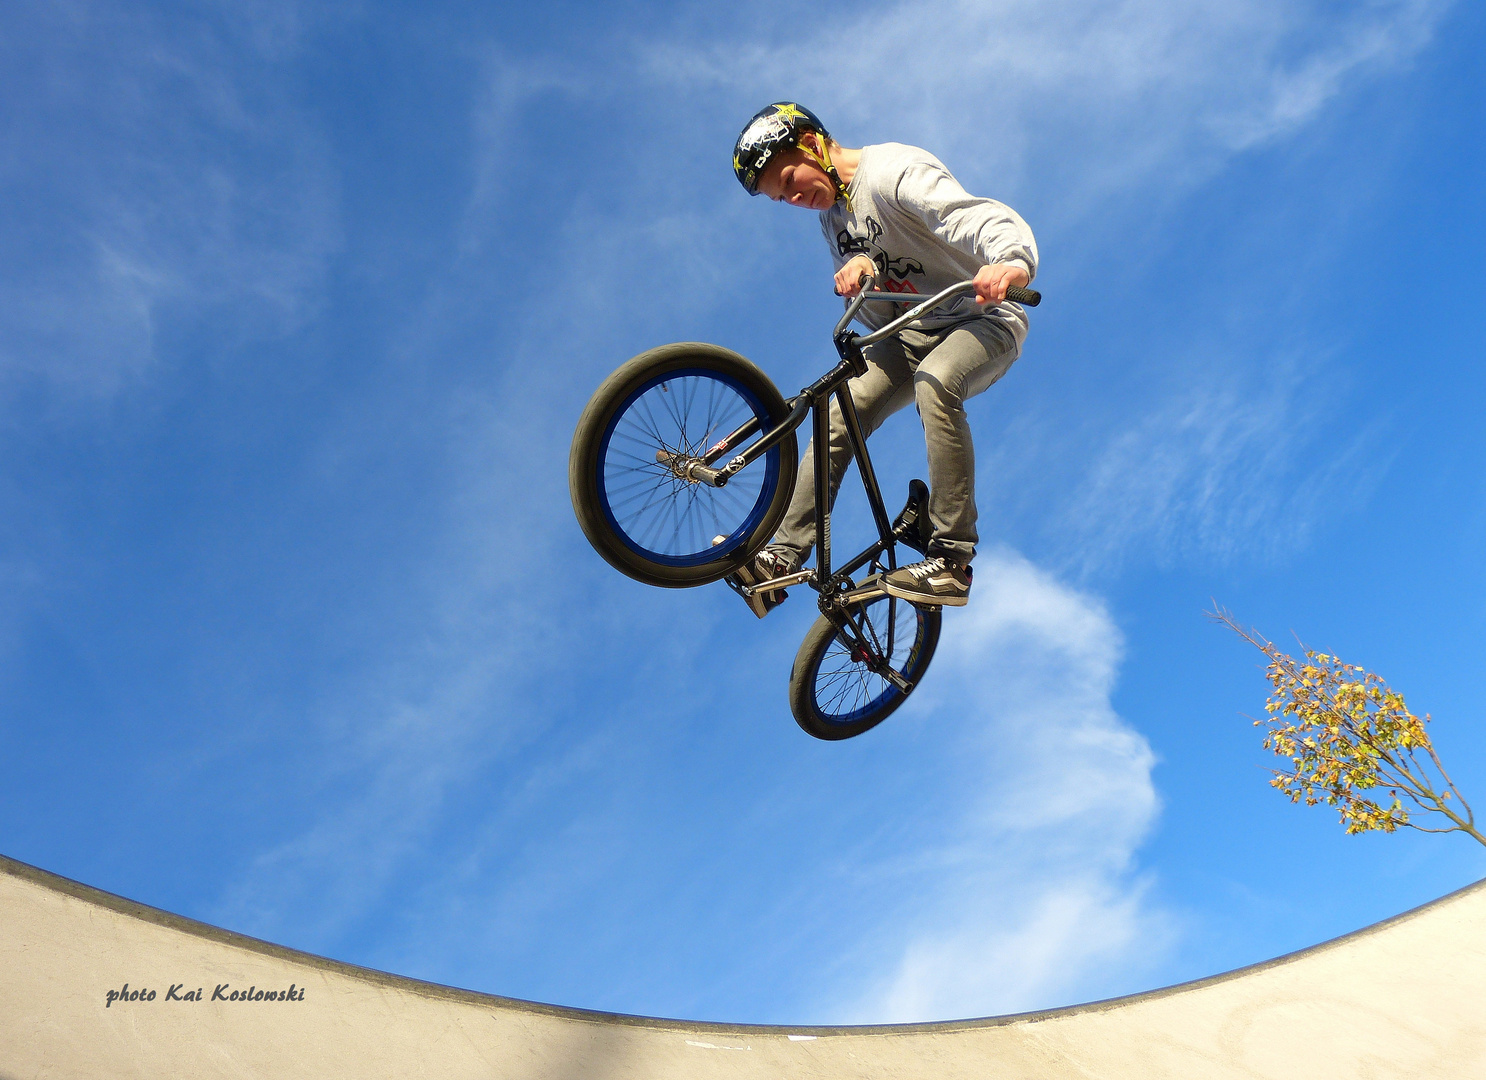 BMX - air springen - Matthias